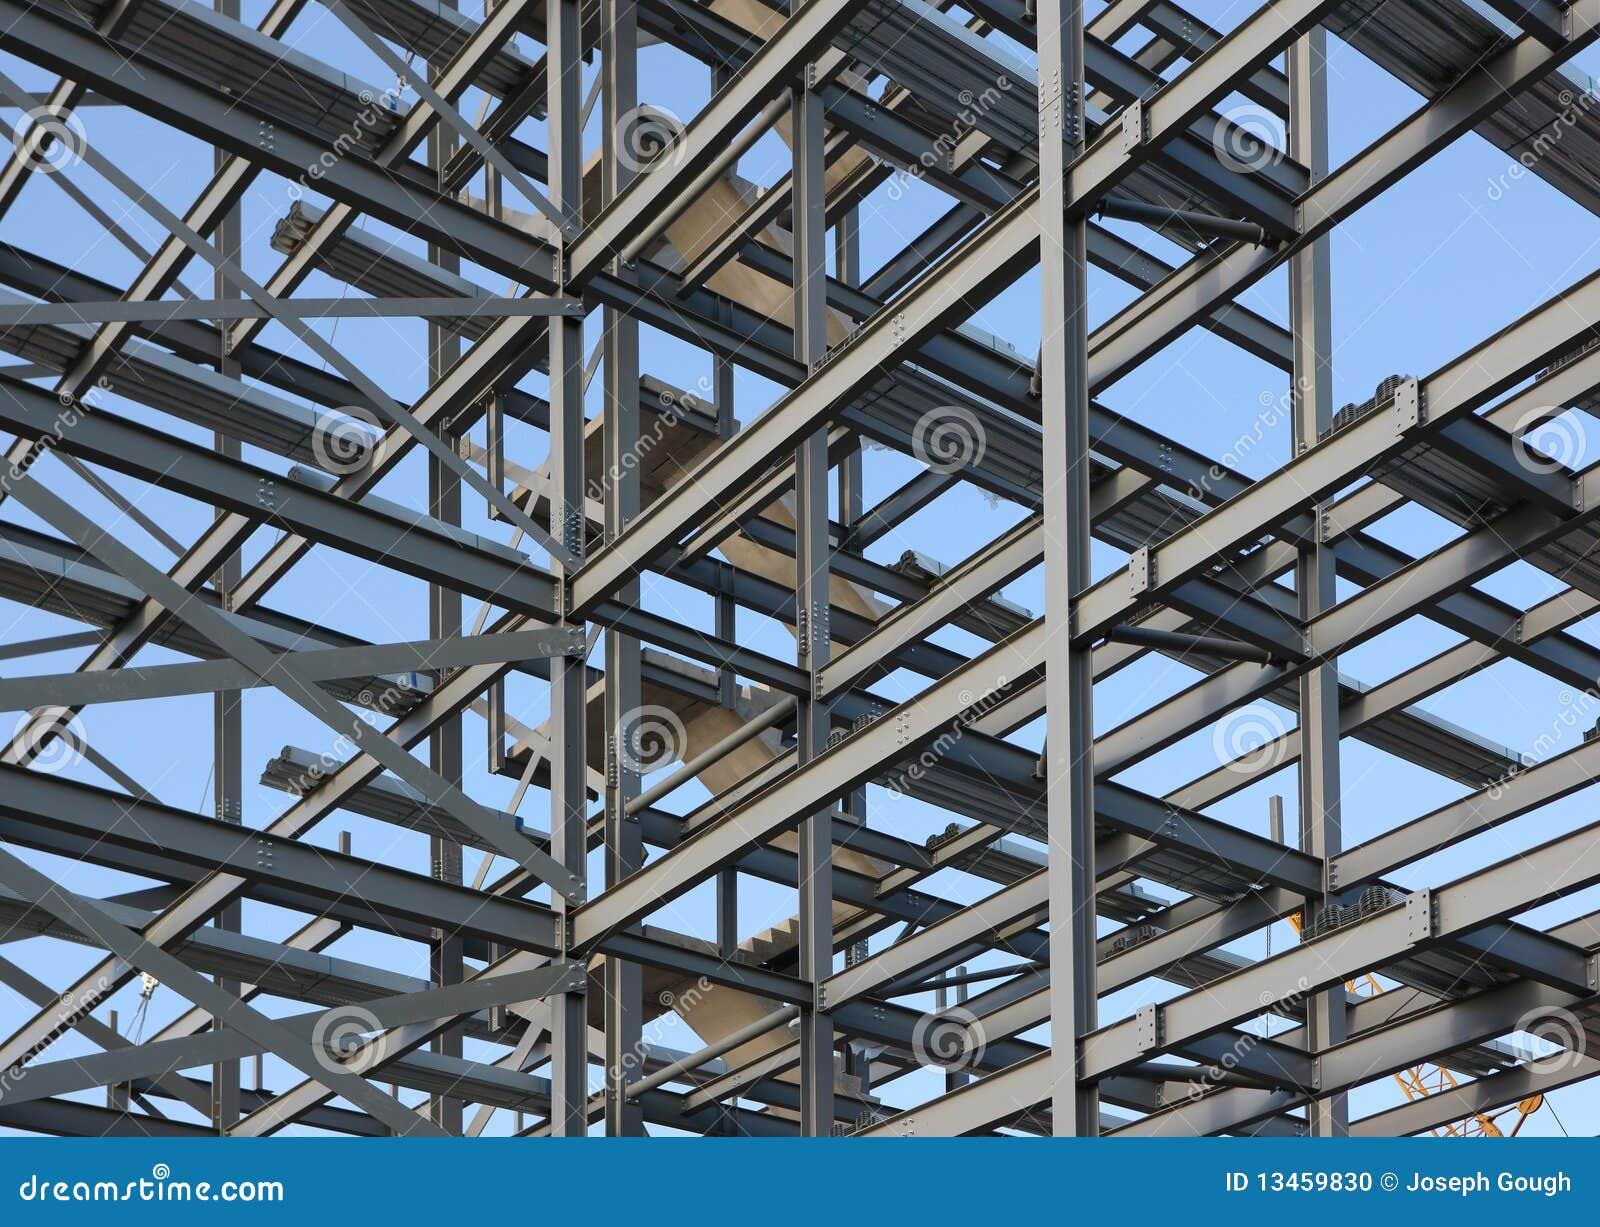 Structural Steel Framework Stock Photo Image Of Metal